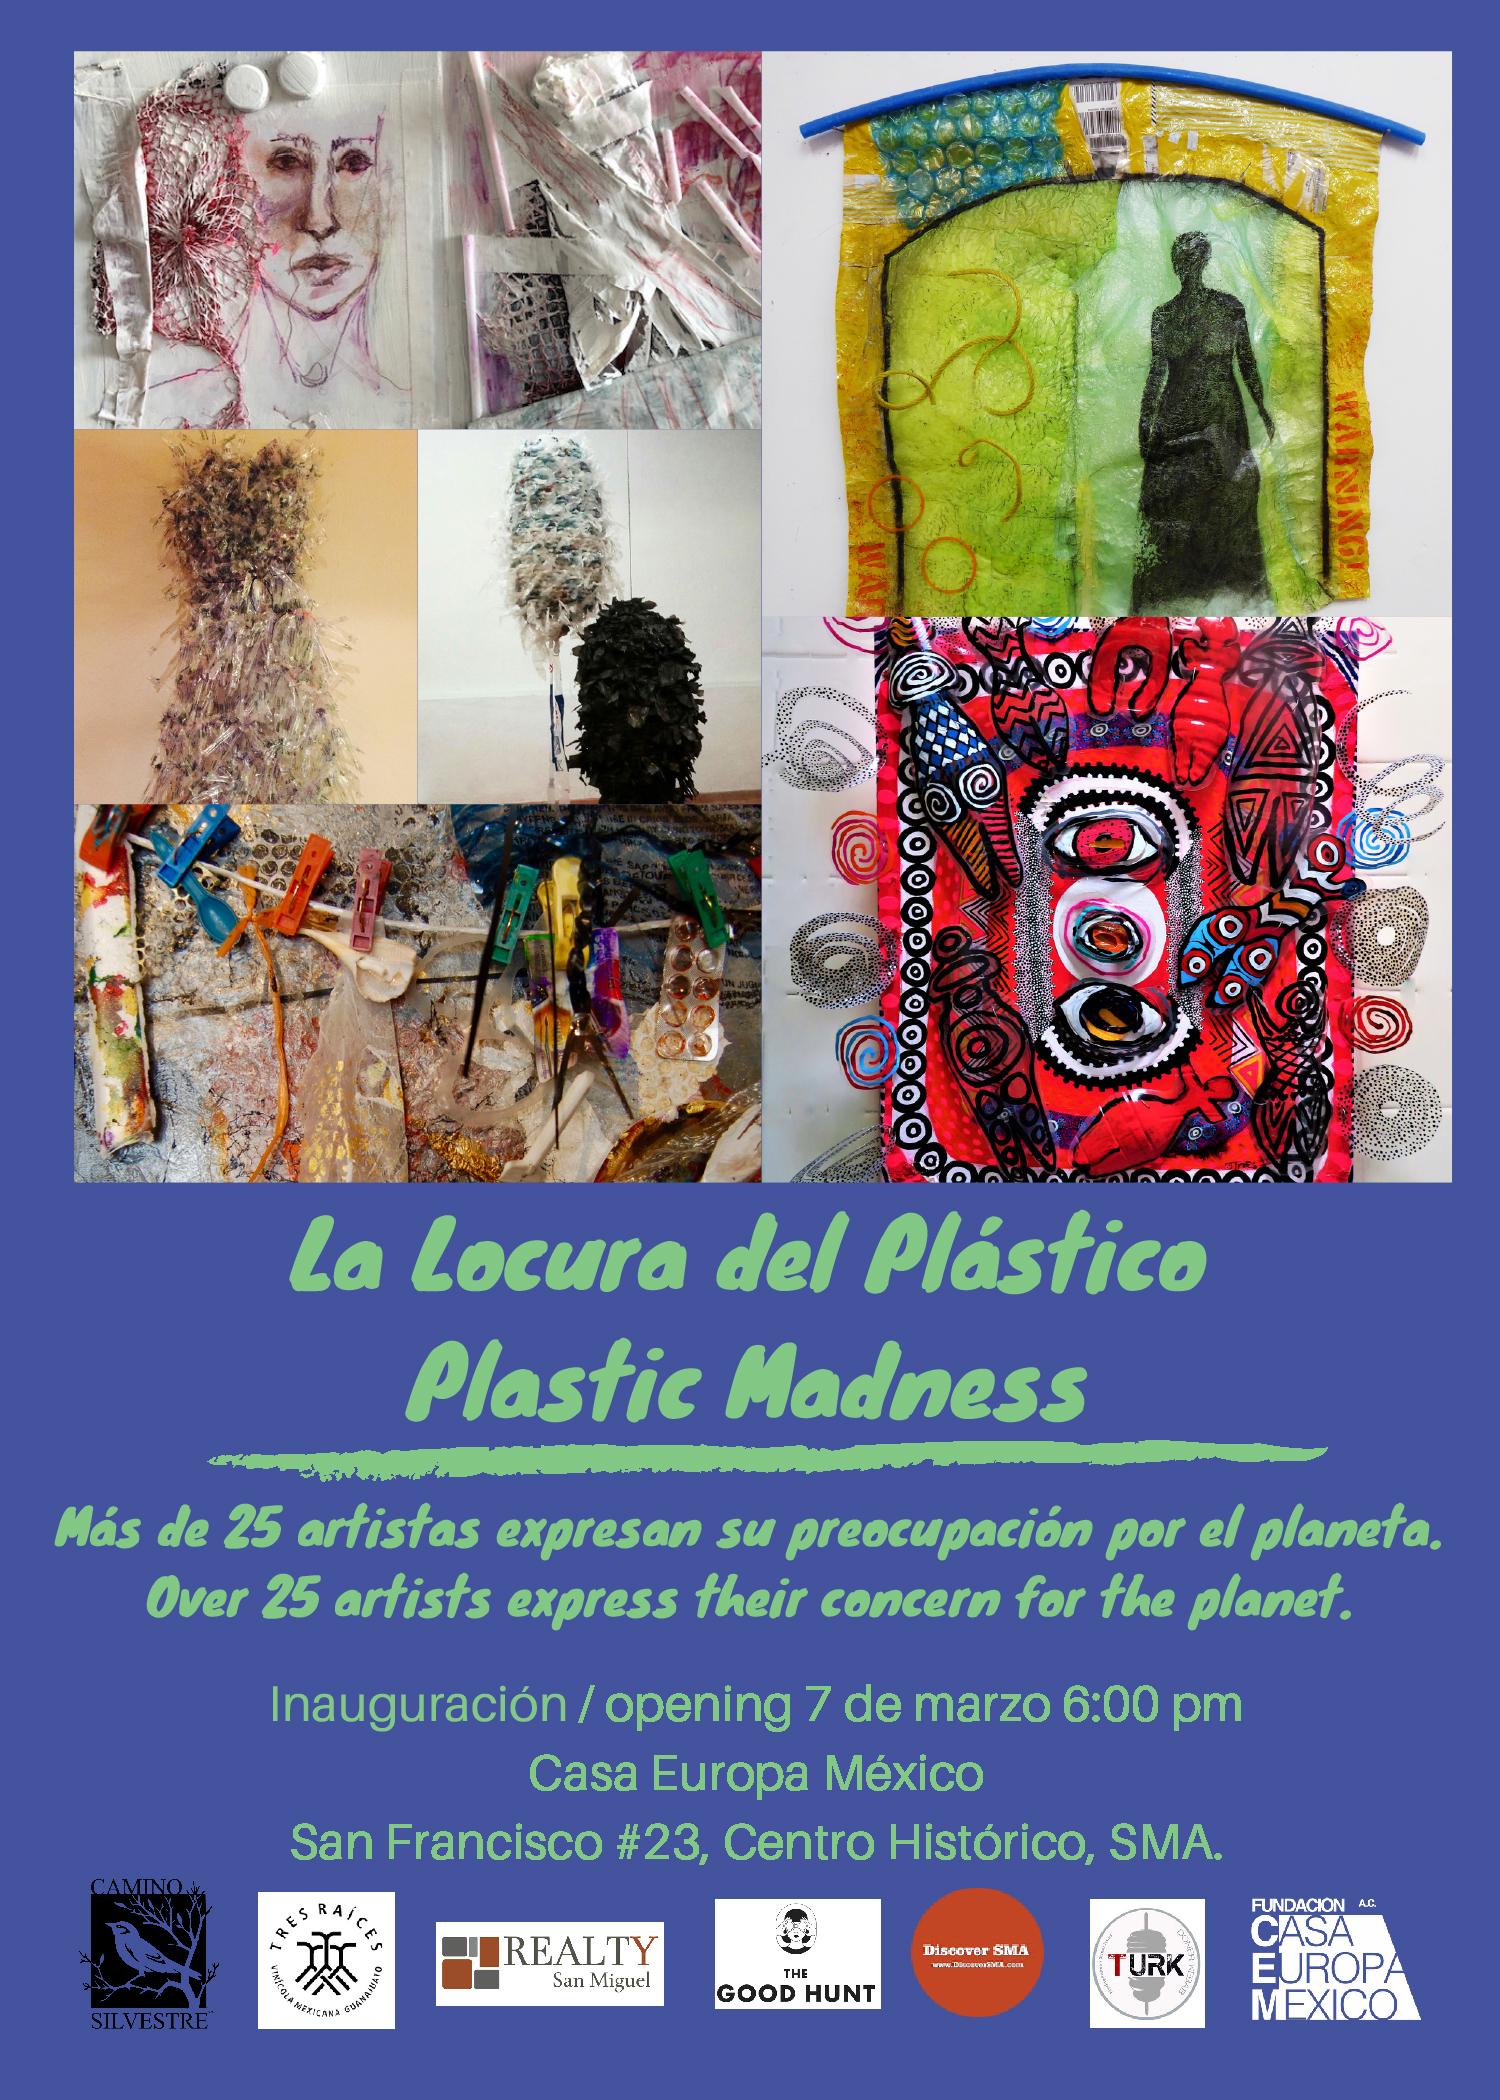 Plastic Madness invitación.jpg